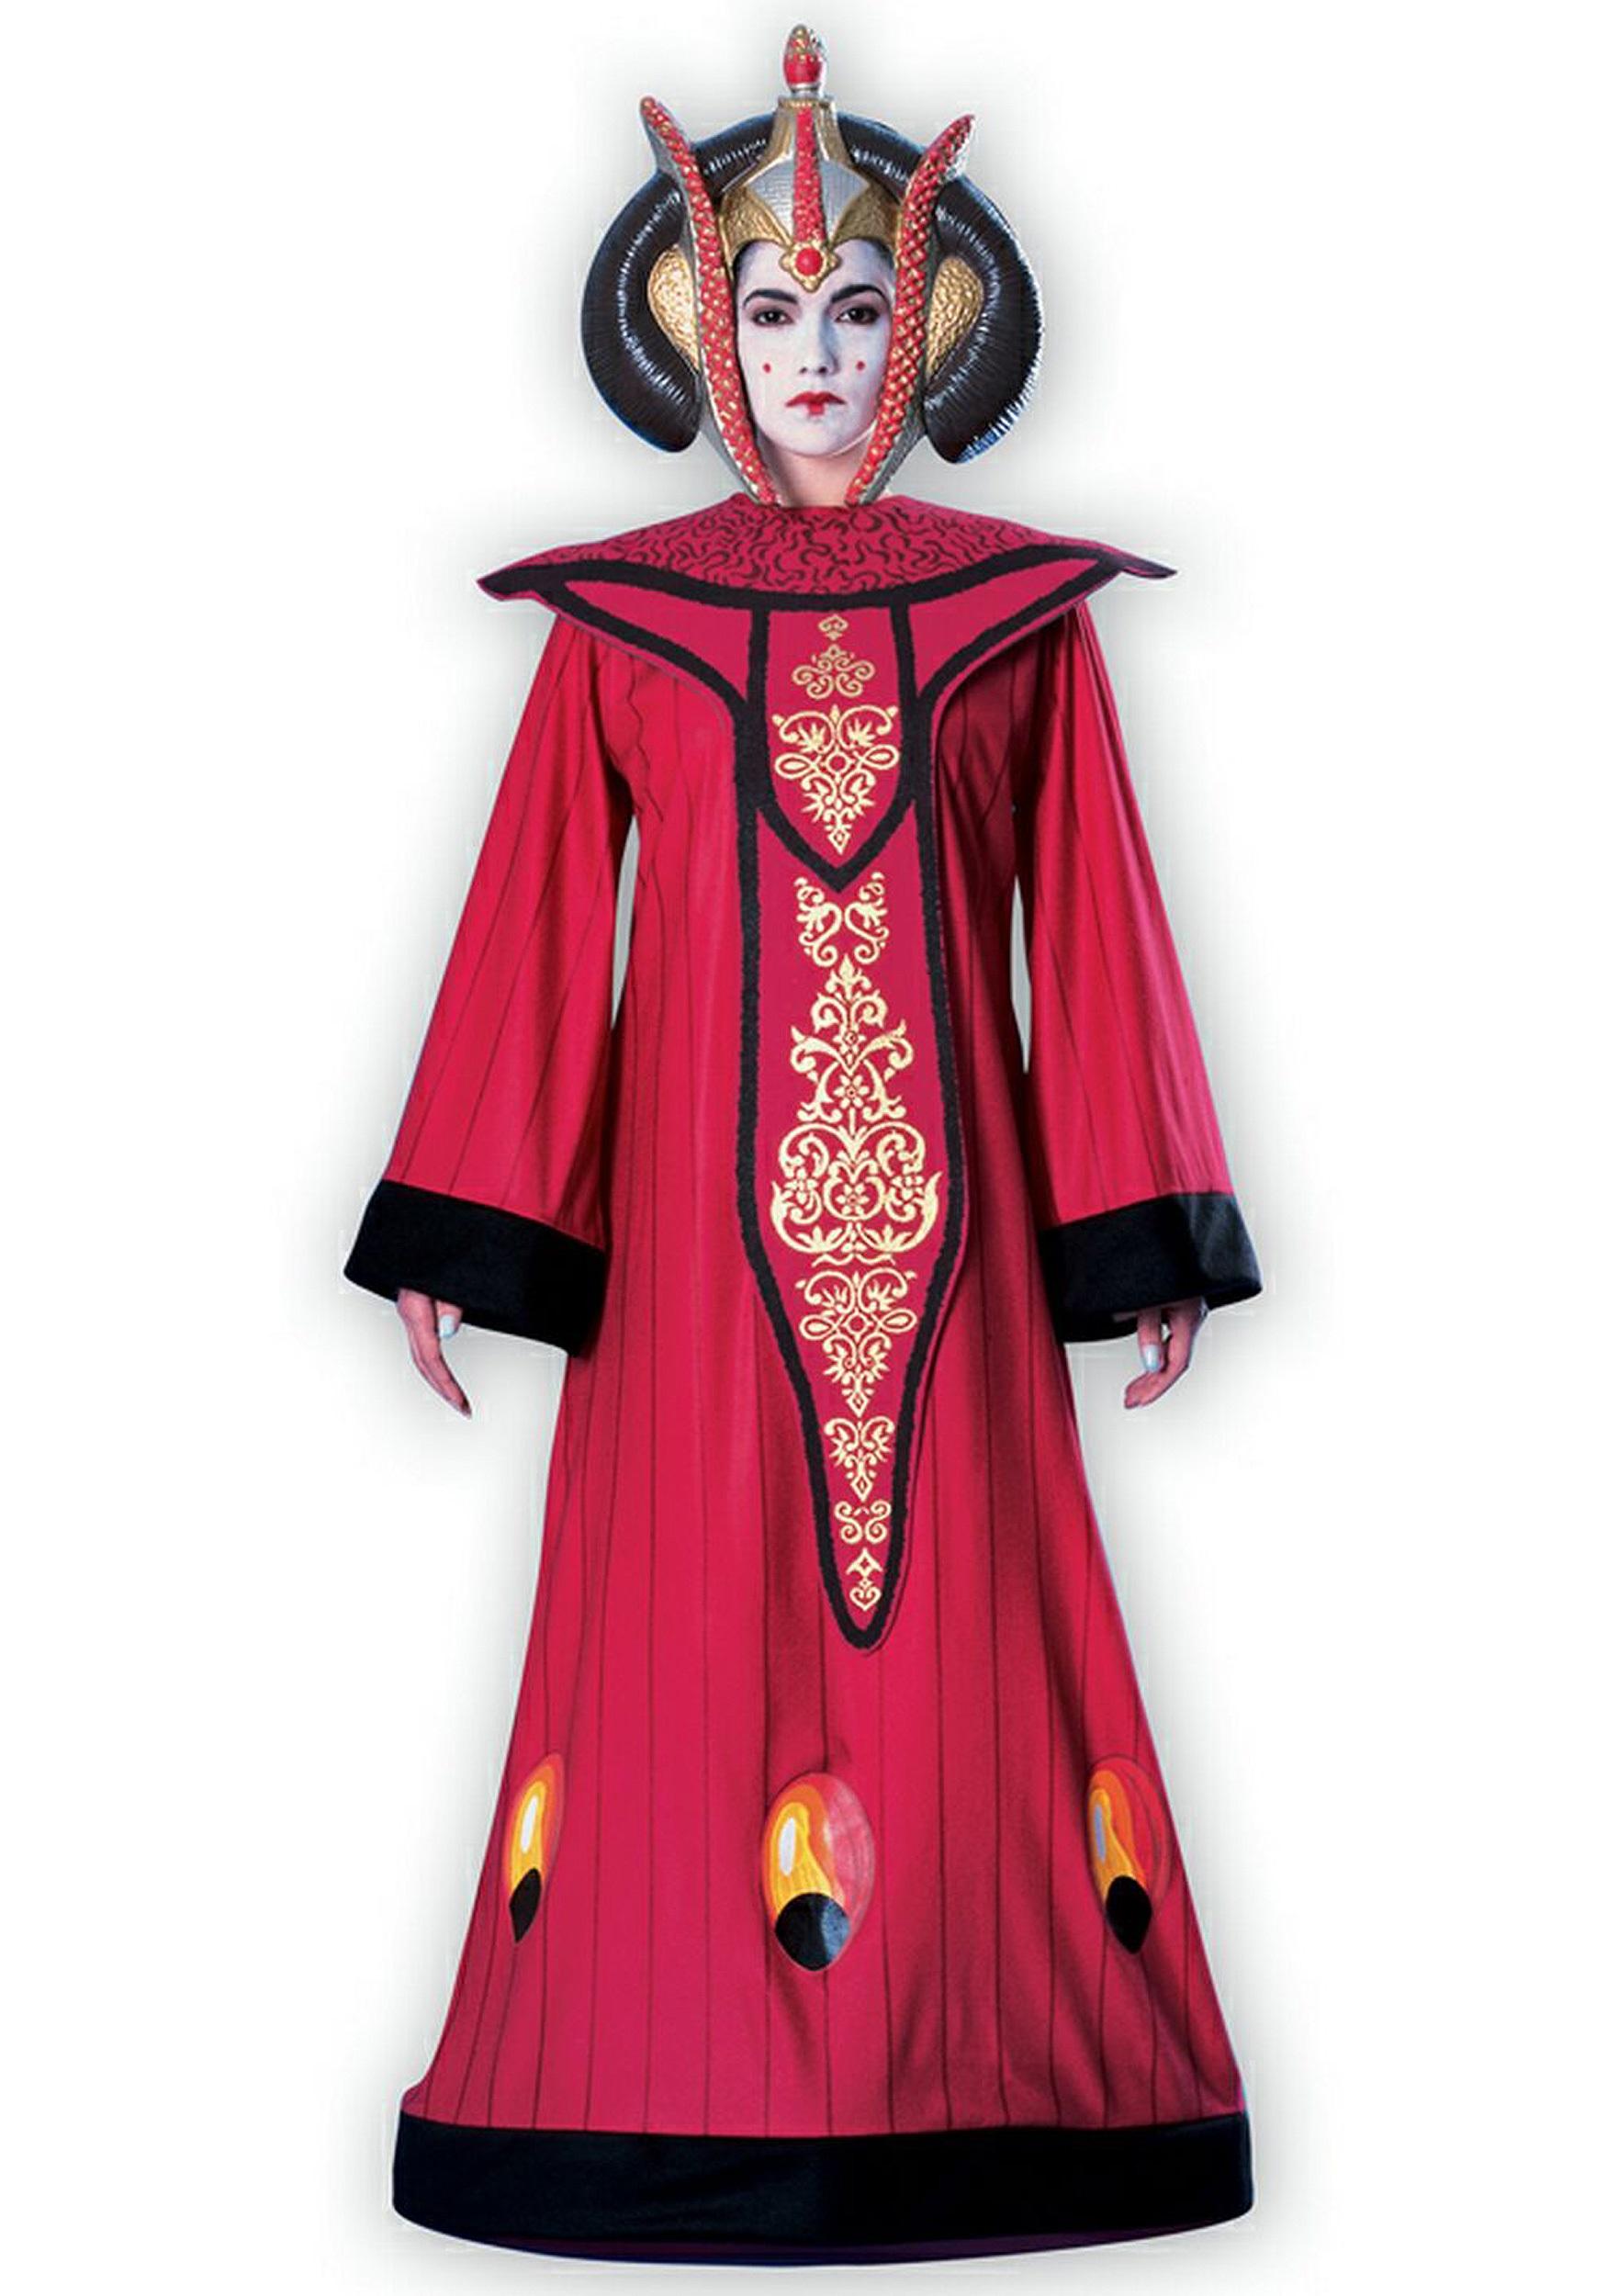 Women's Queen Amidala Costume from Star Wars